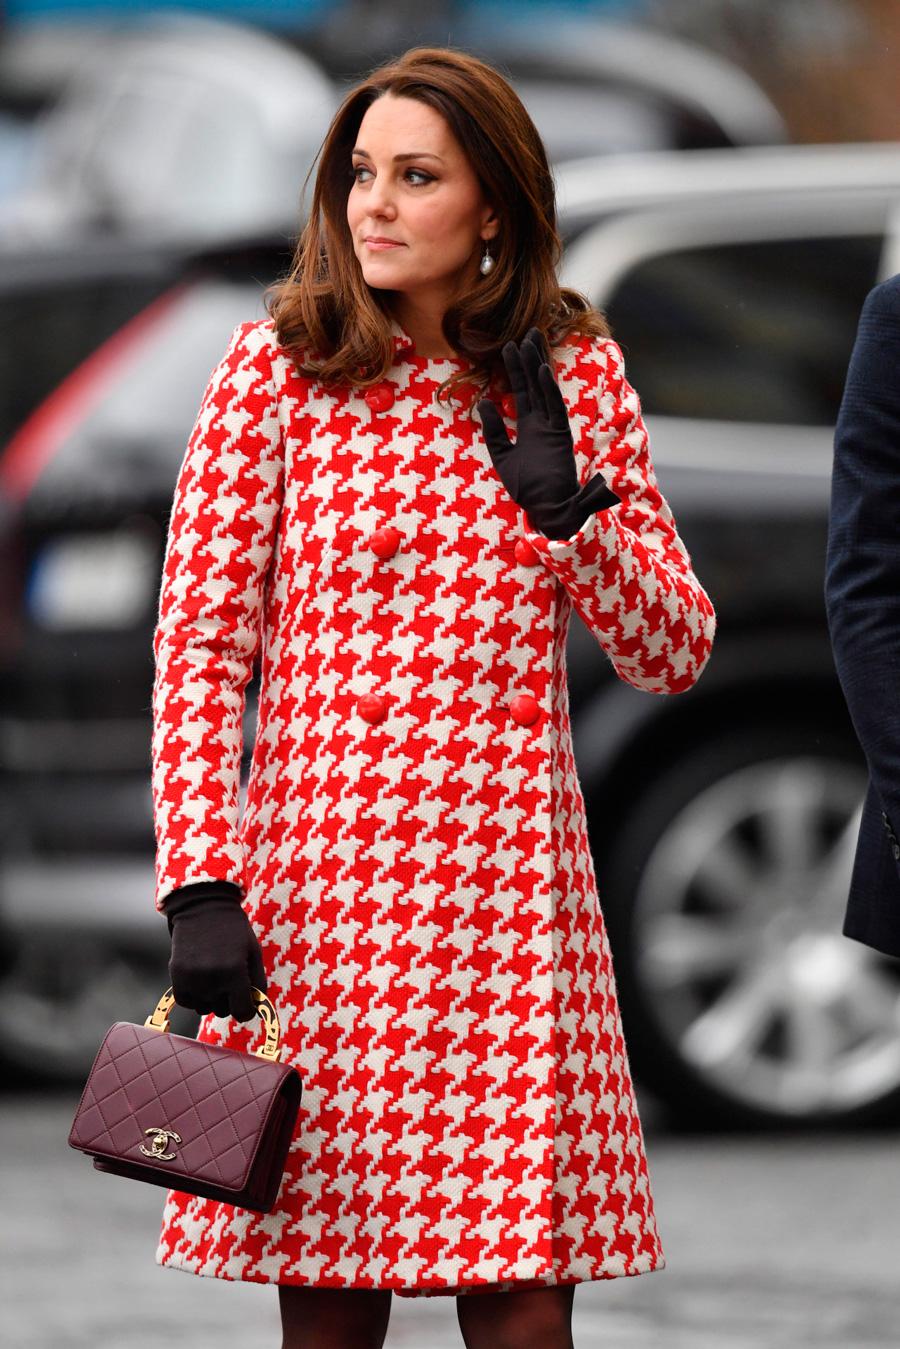 203 Fotos de Kate Middleton - Pagina 2